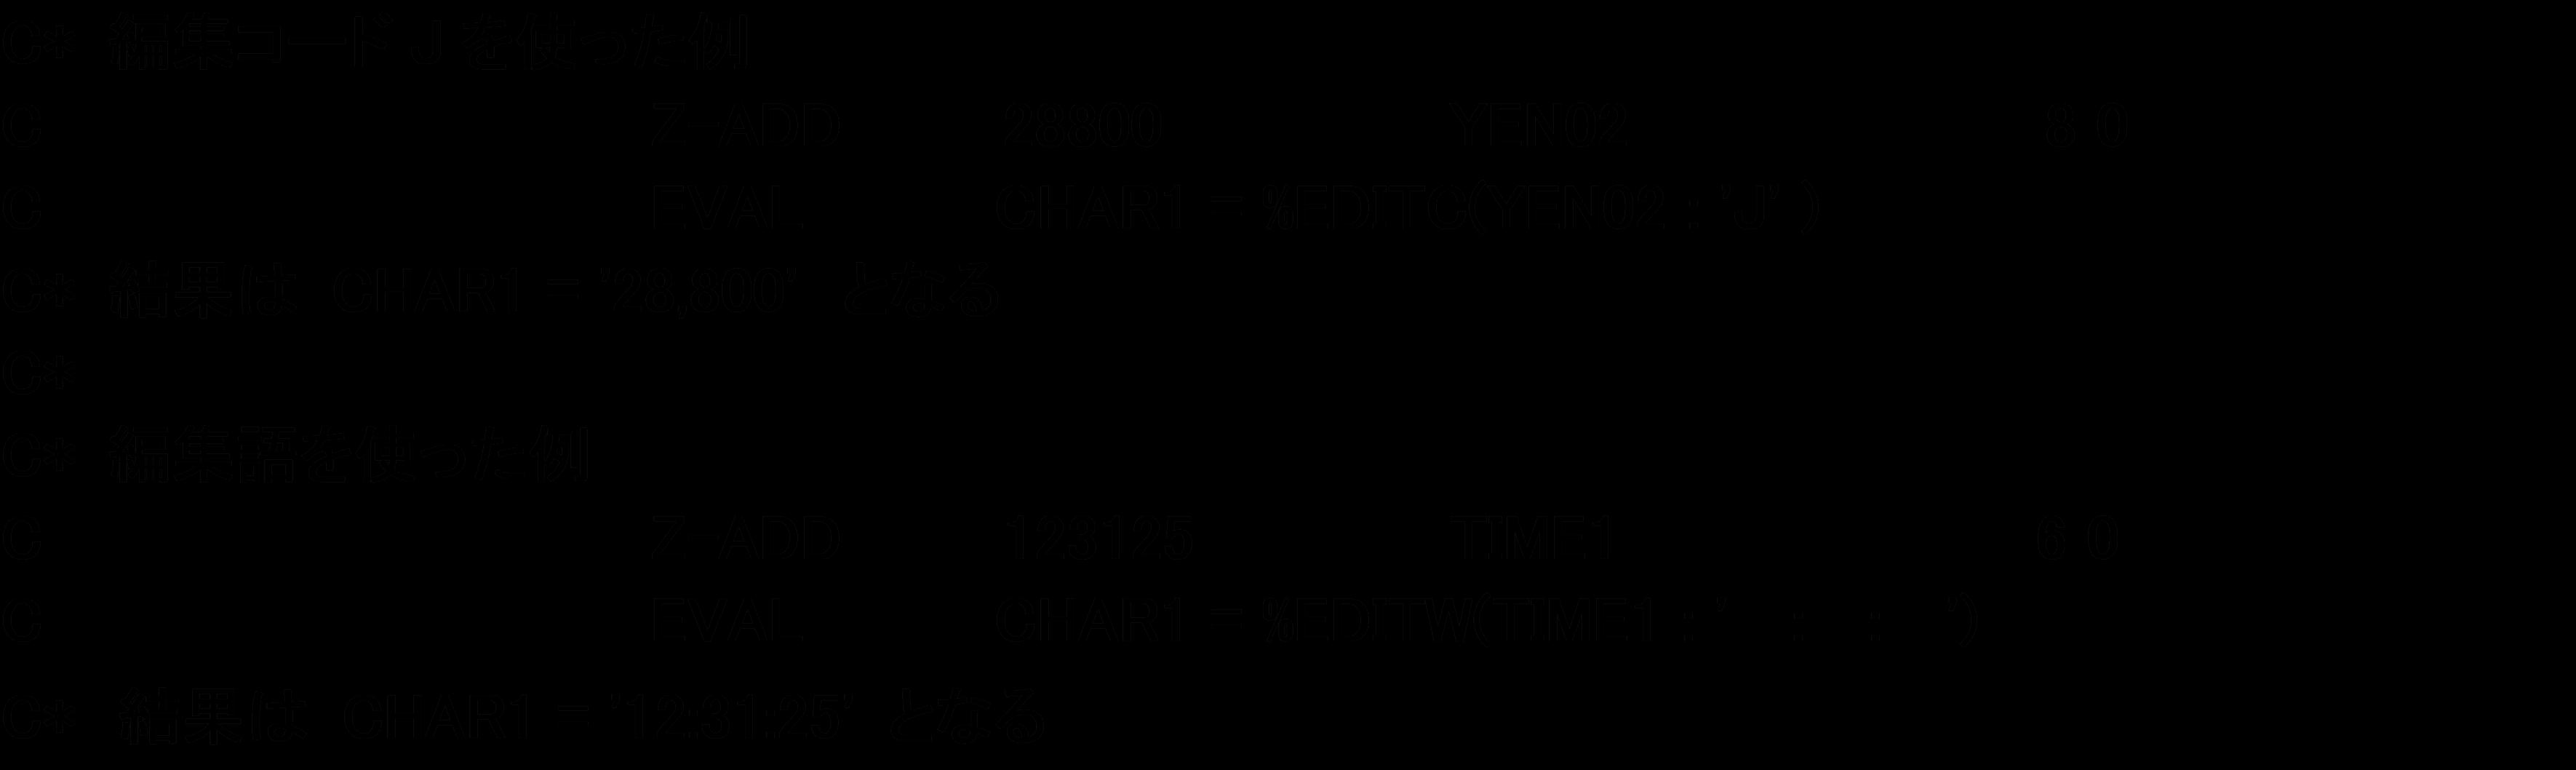 %EDITCと%EDITWの使用例